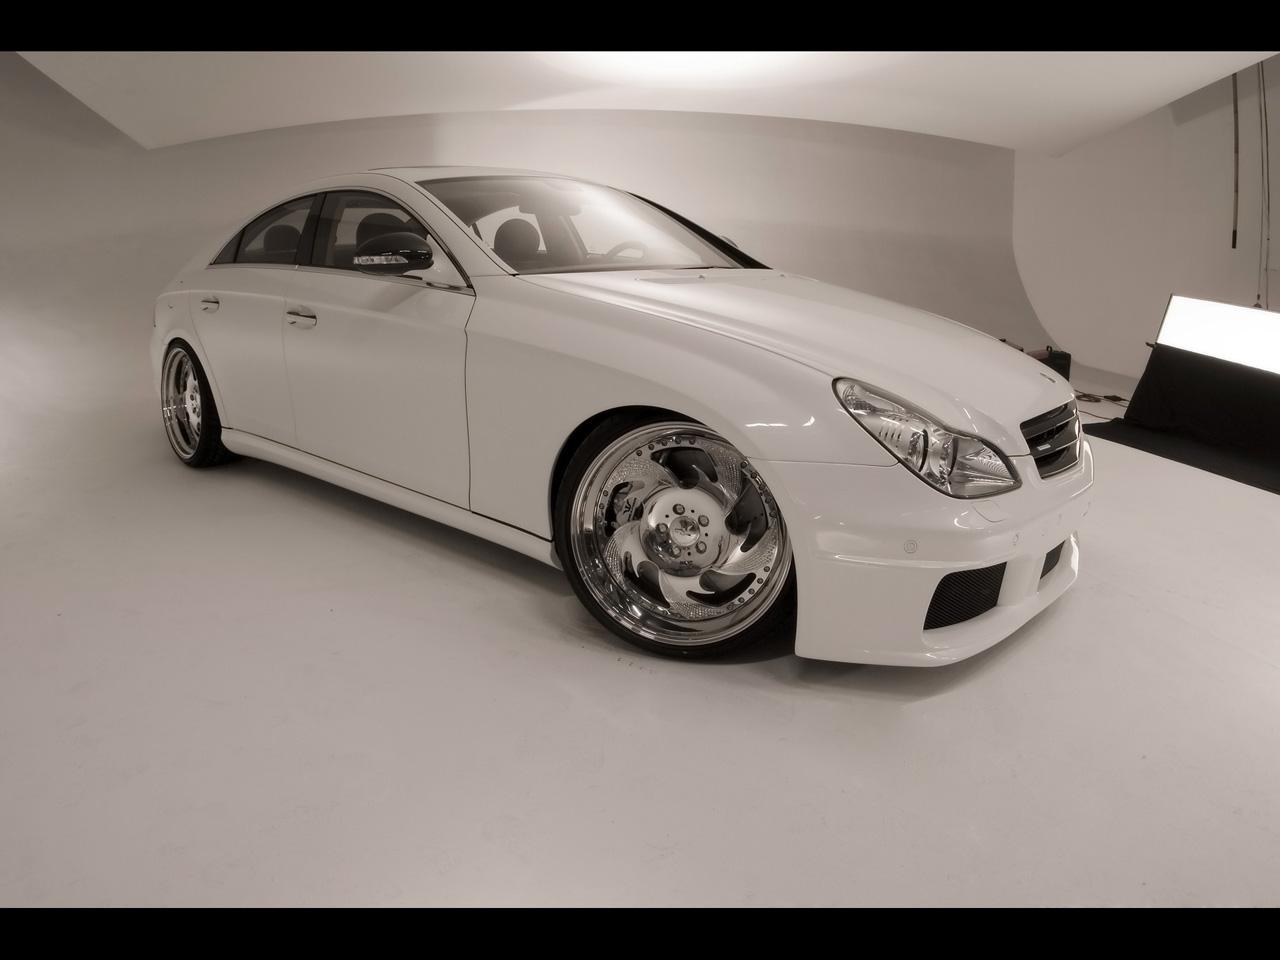 2009 Wheelsandmore Mercedes Benz CLS Wallpapers